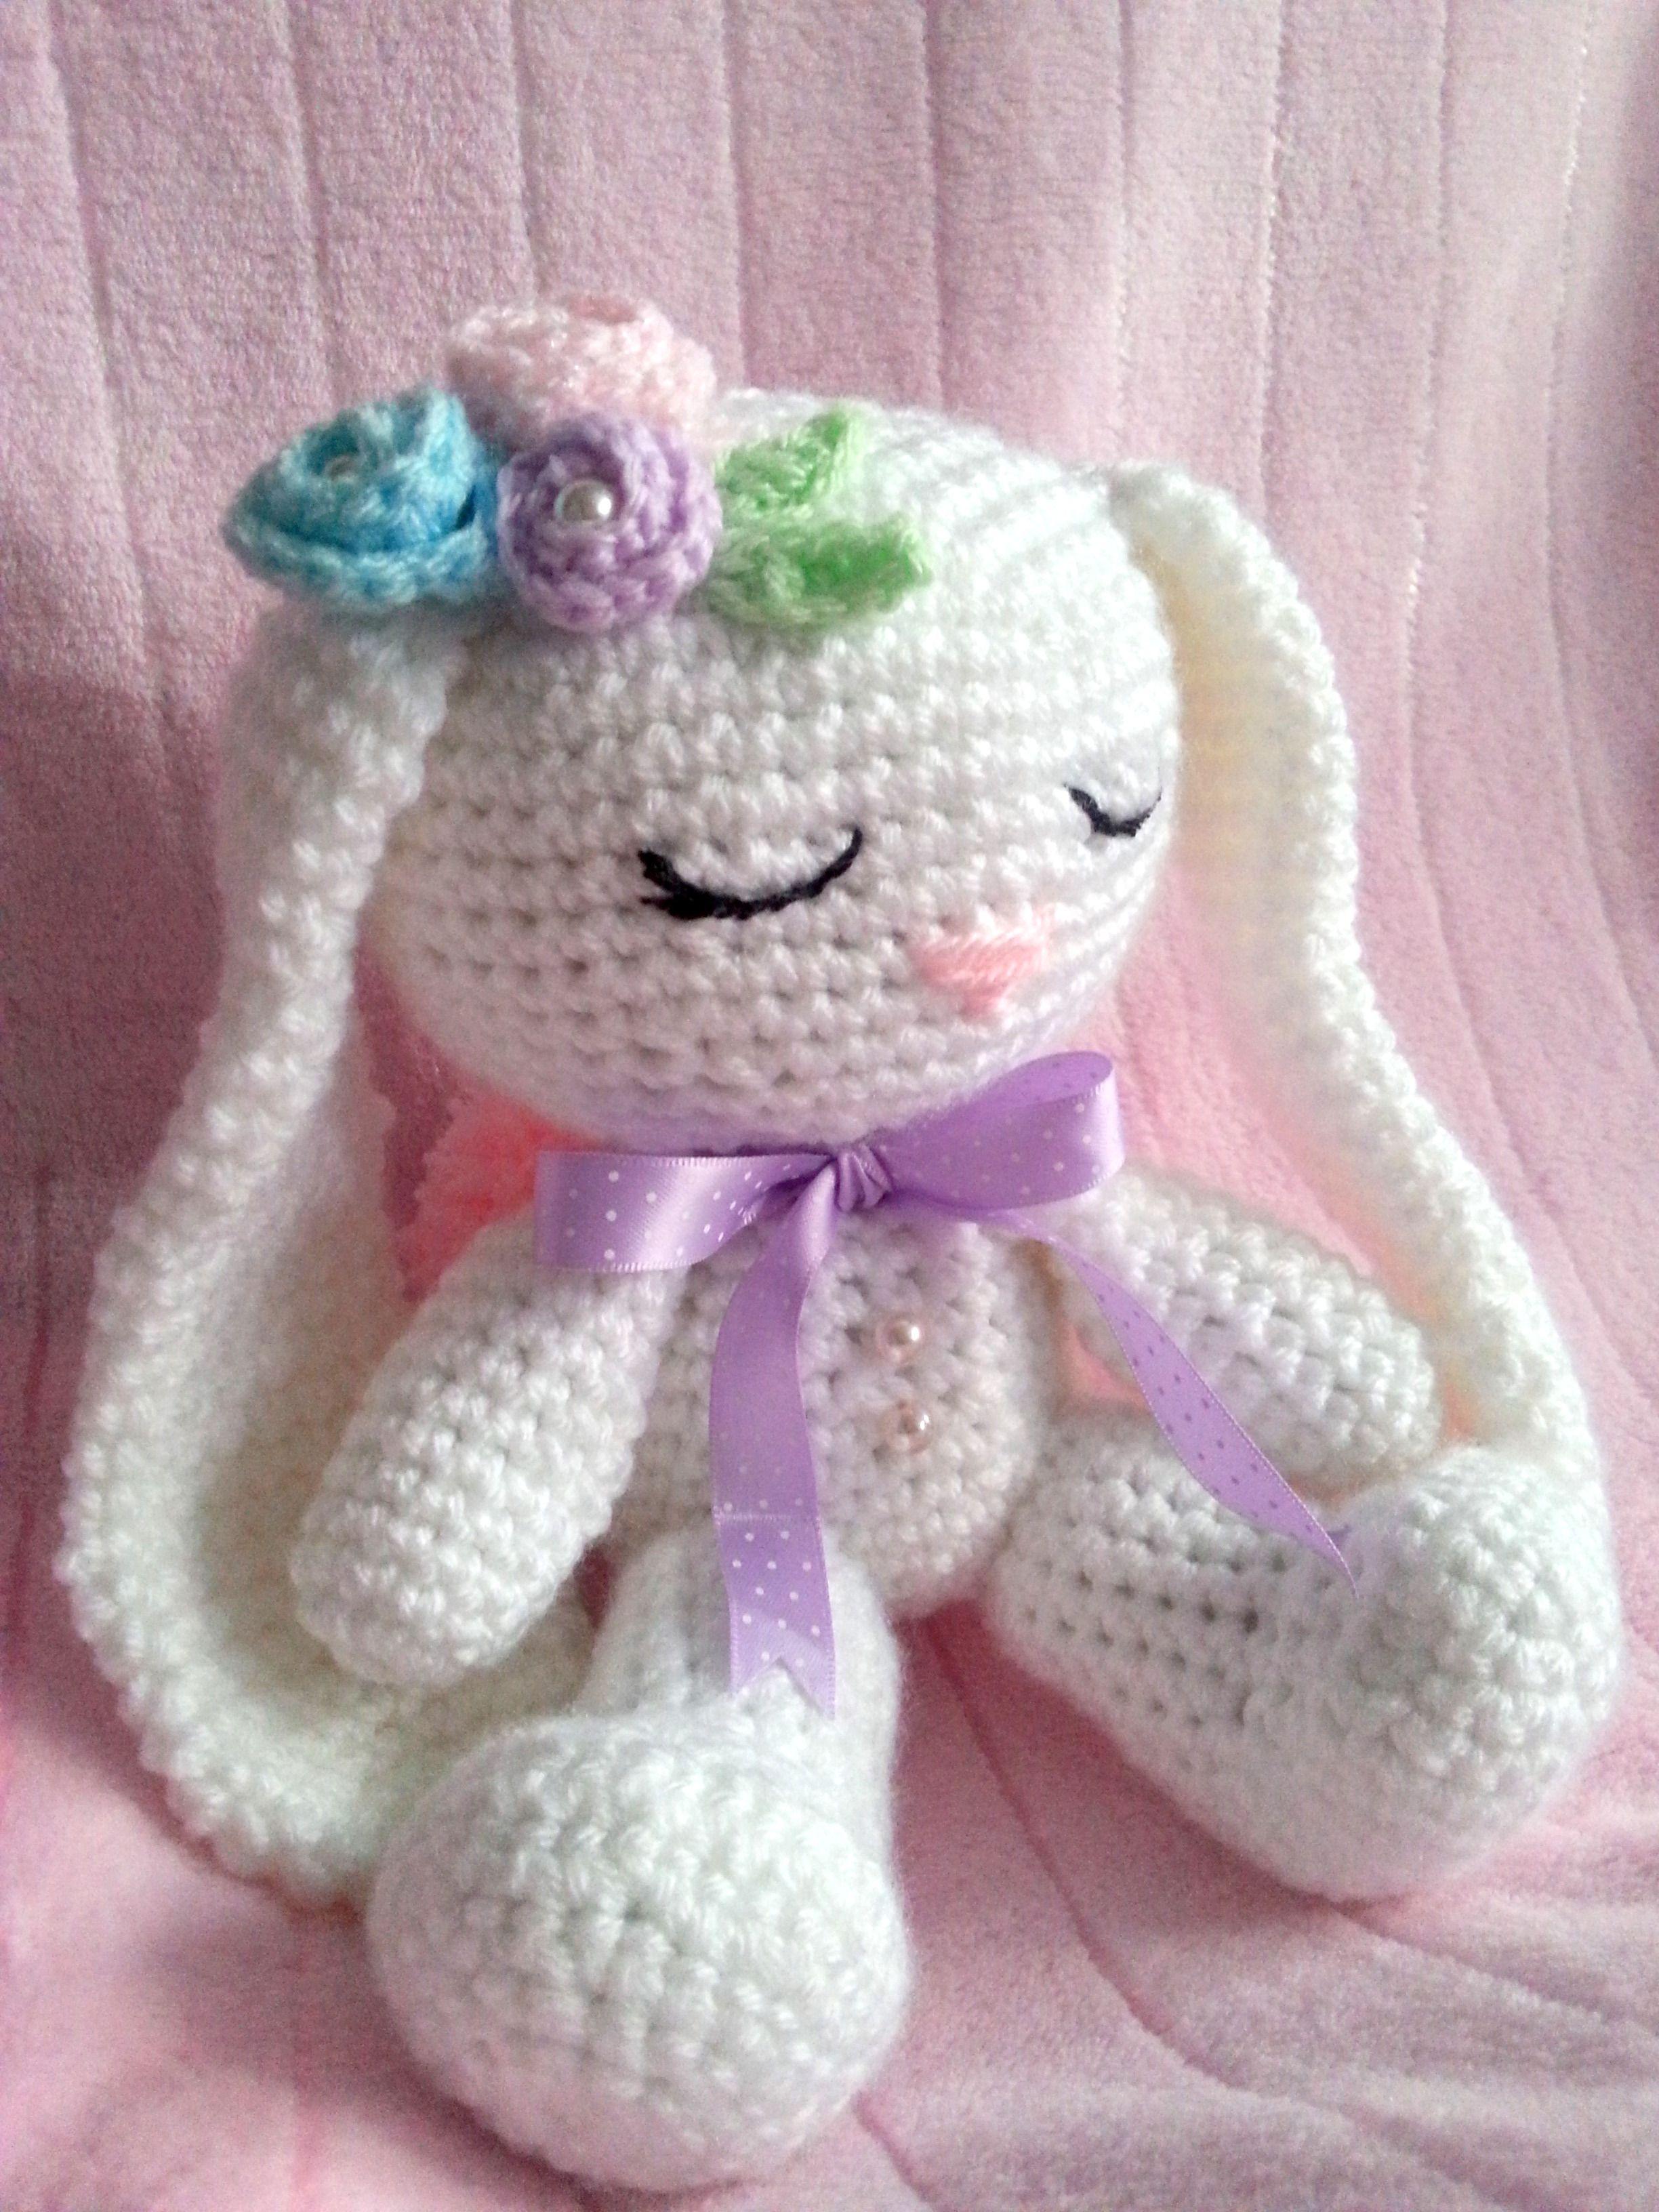 How To Crochet An Amigurumi Rabbit : crochet, amigurumi bunny Crochet Pinterest